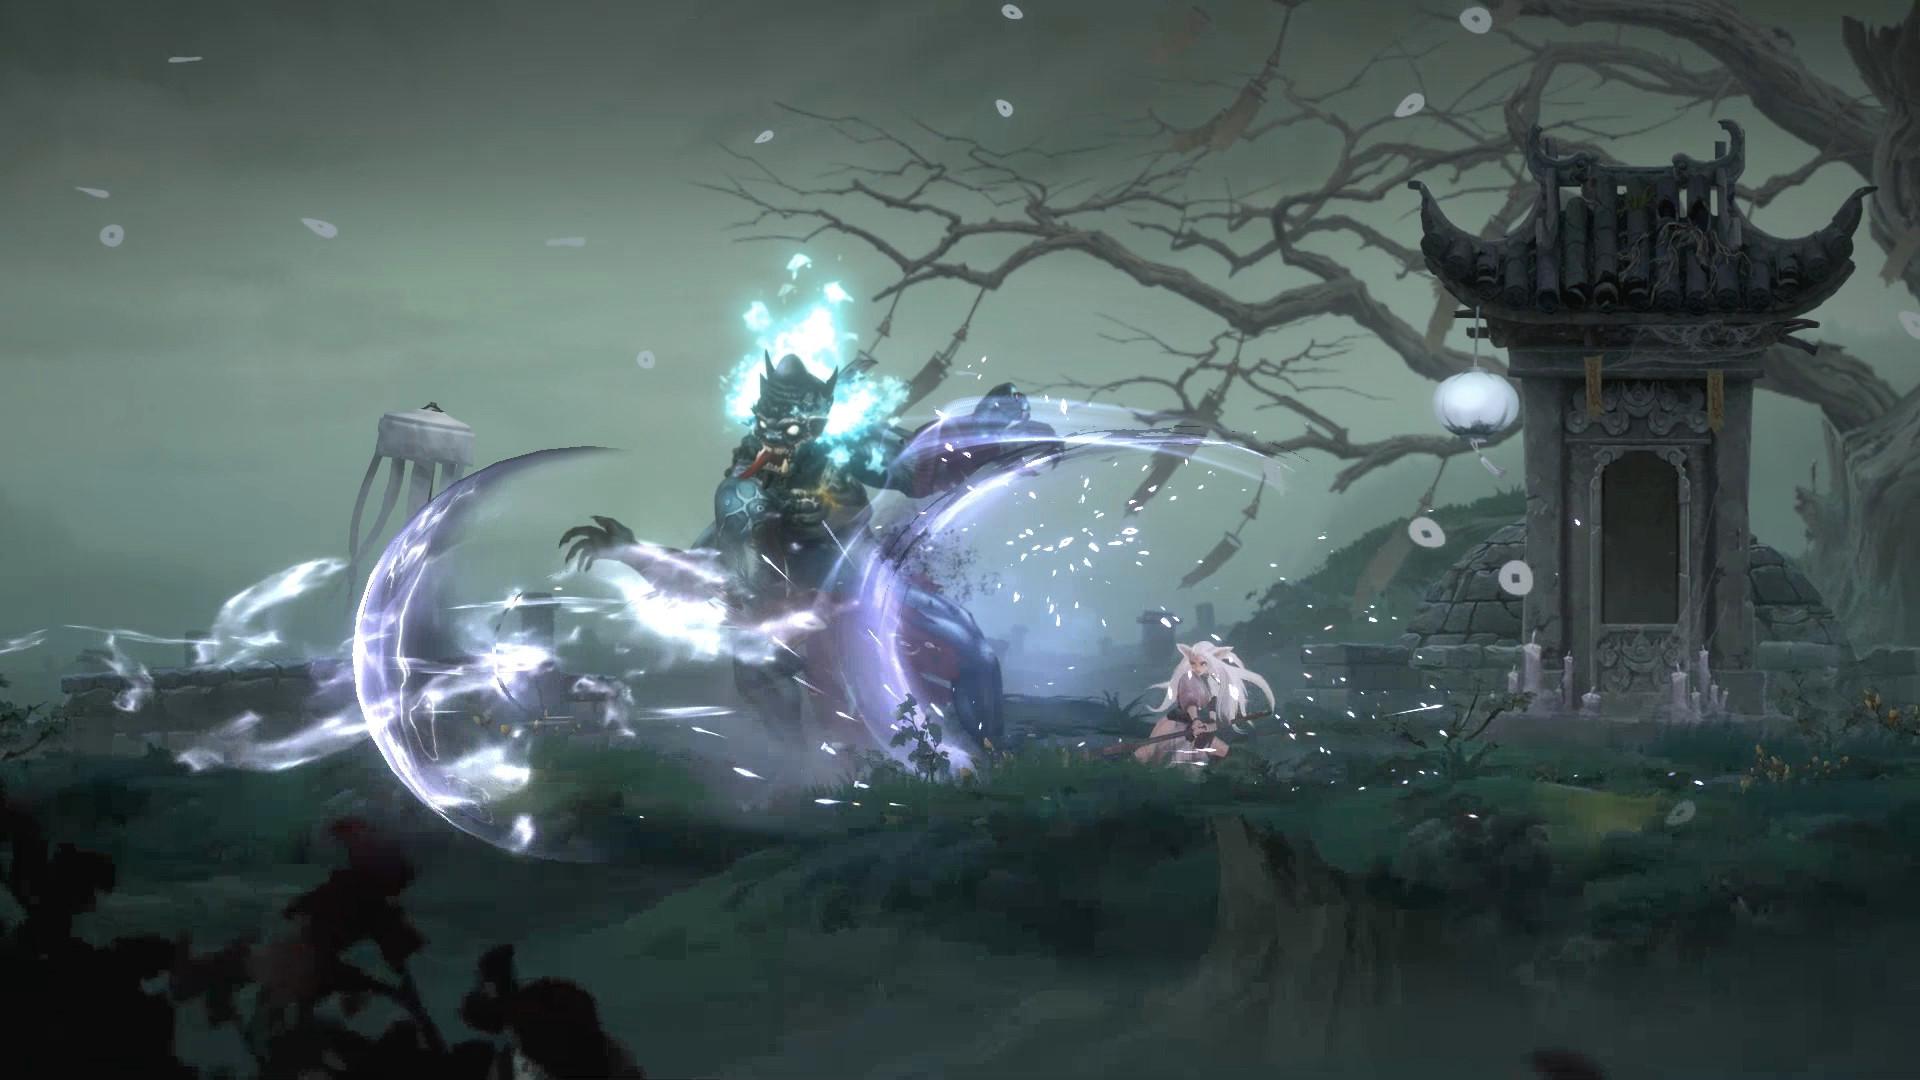 eastern-exorcist-pc-screenshot-3